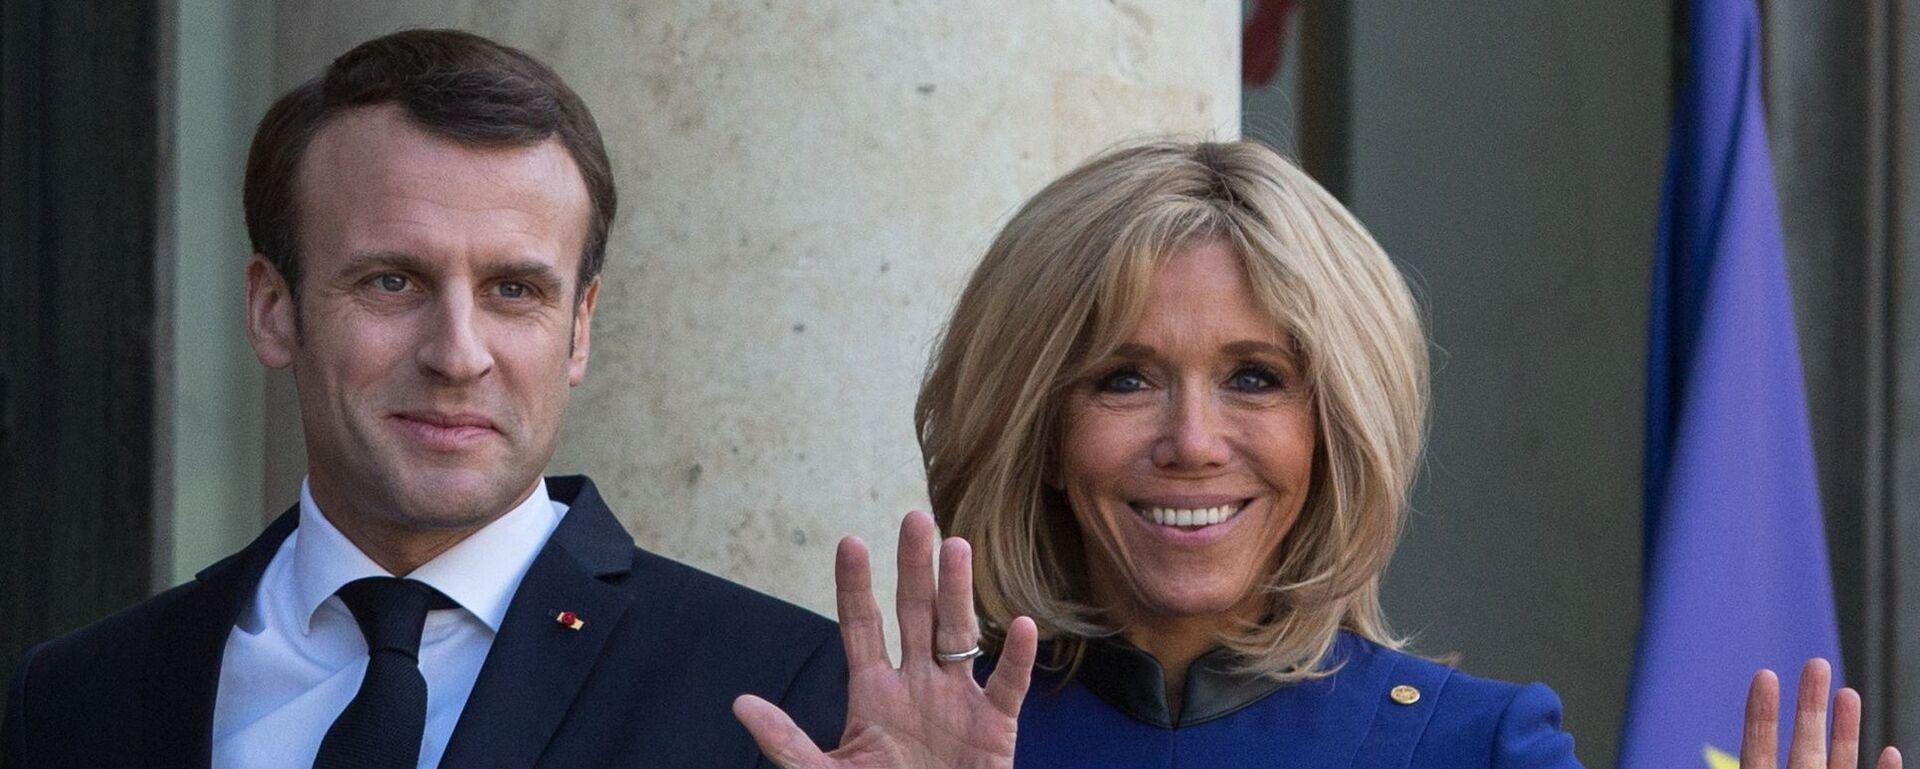 Brigitte e Emmanuel Macron - Sputnik Italia, 1920, 26.09.2021